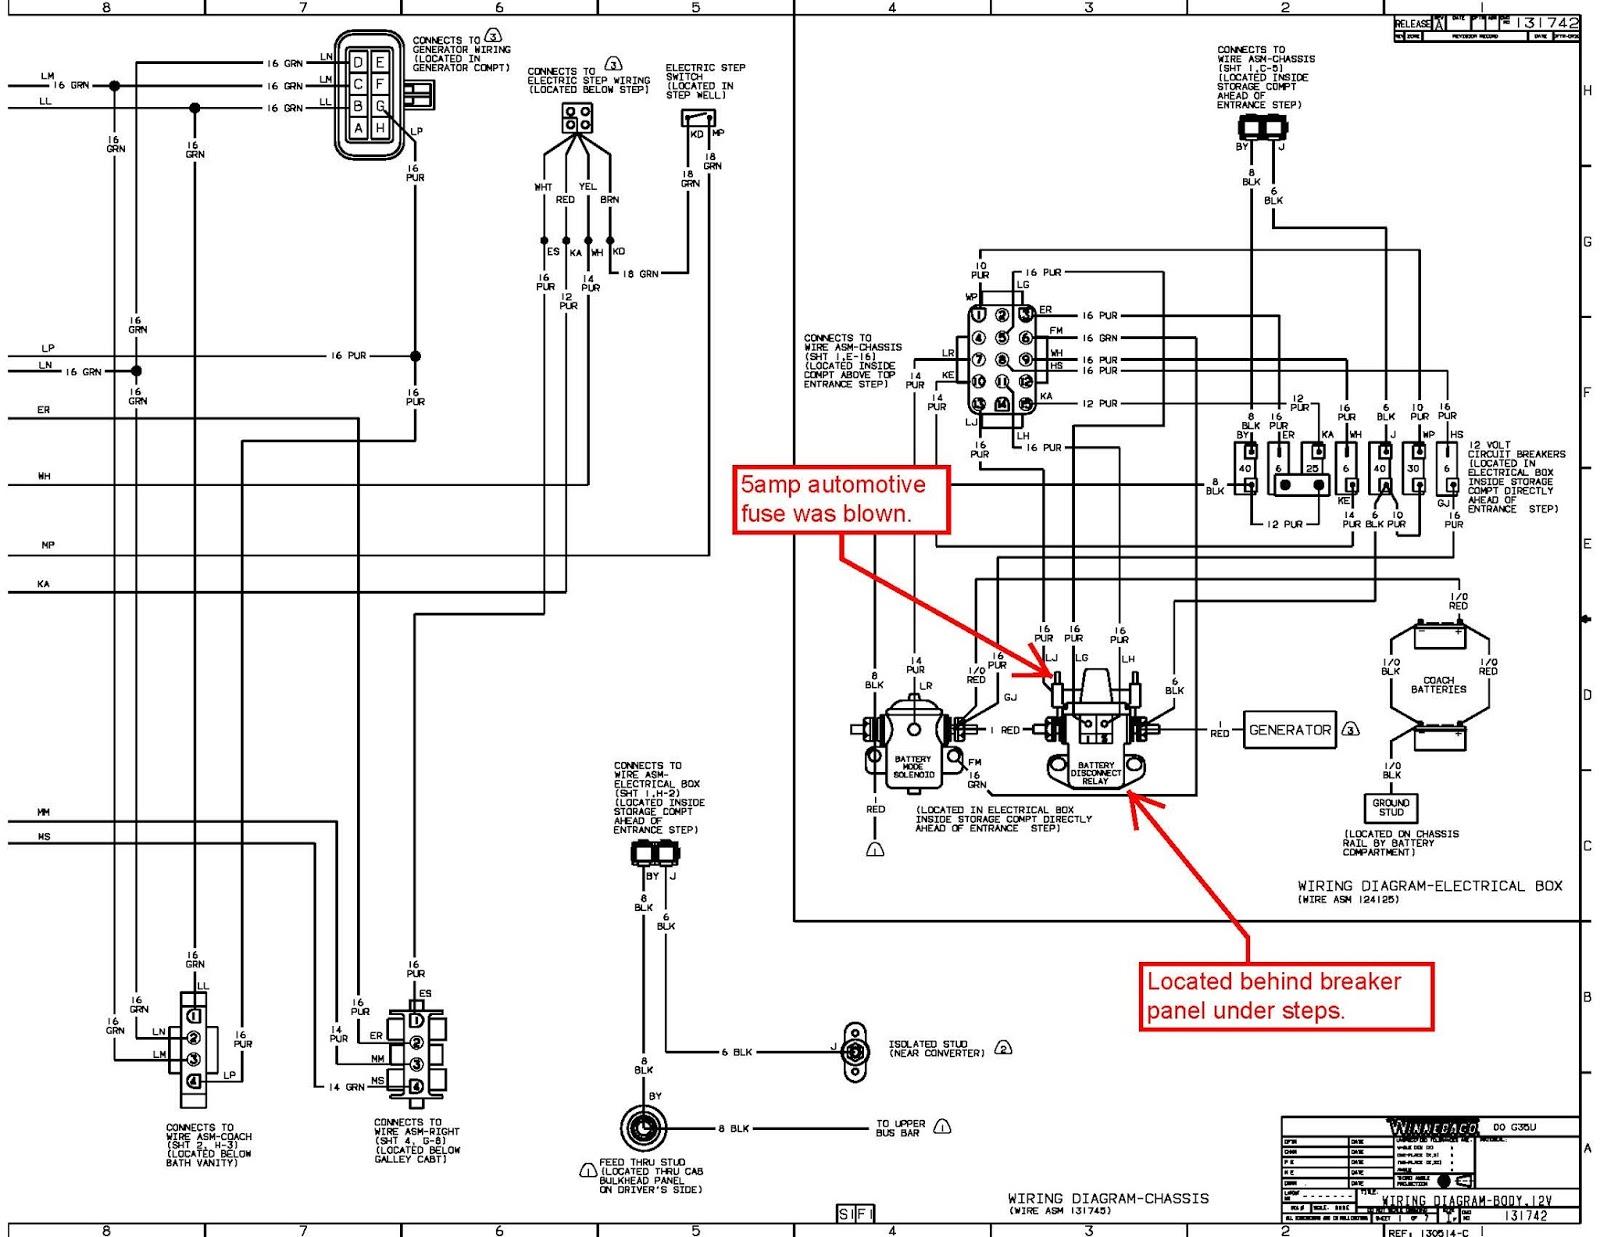 Winnebago Motorhome Wiring Diagram - Complete Wiring Schemas